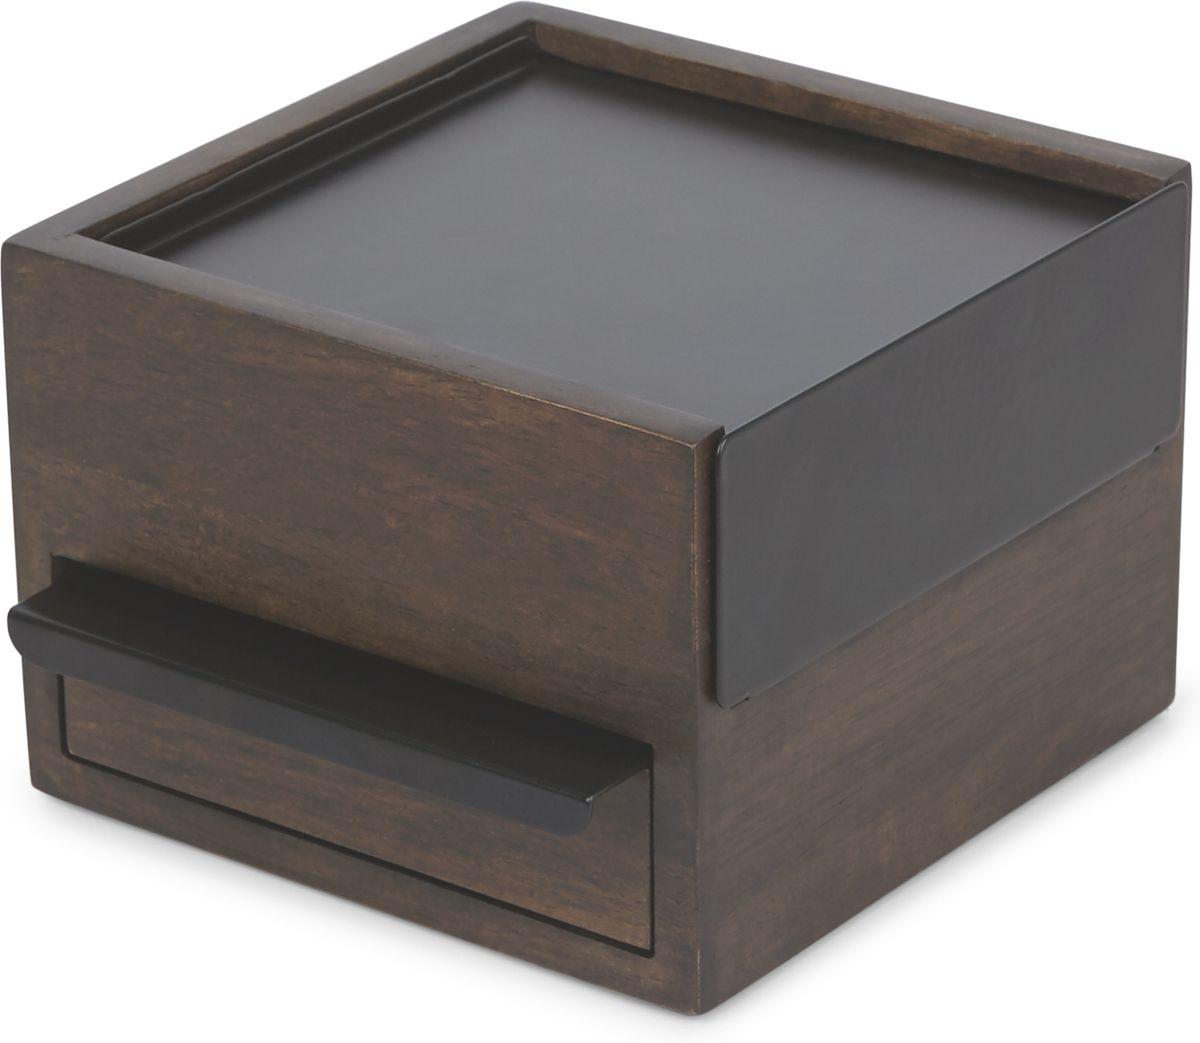 "Шкатулка для украшений Umbra ""Stowit Mini"", цвет: черный, орех, 10,9 х 16,7 х 15,2 см"